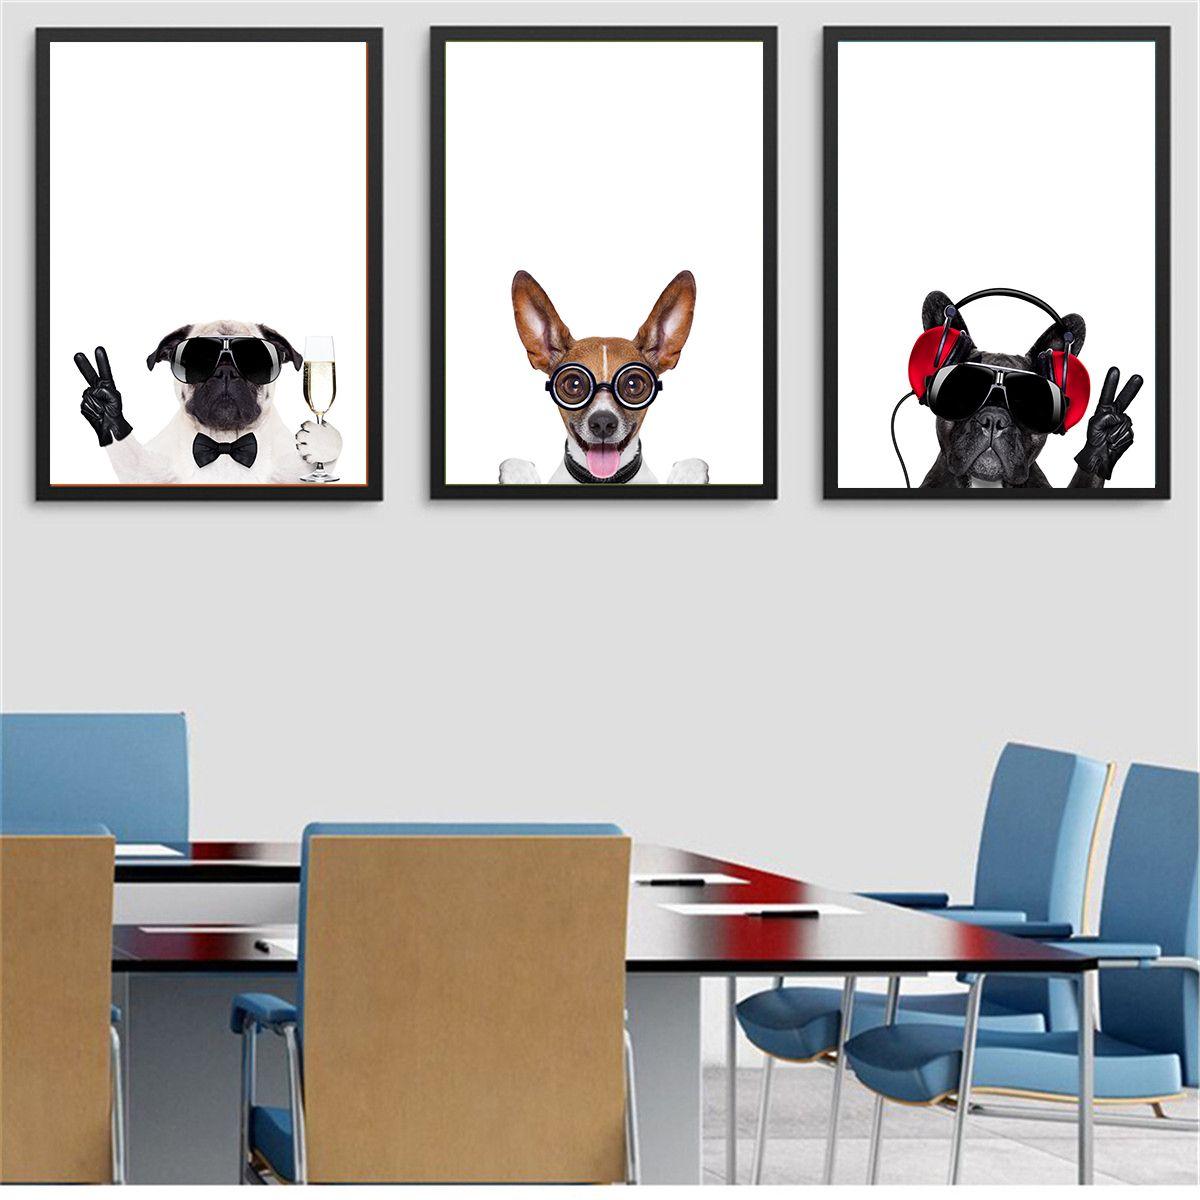 Funny Pug JRT Terrier Frenchie Dog Canvas Print Pet Decor